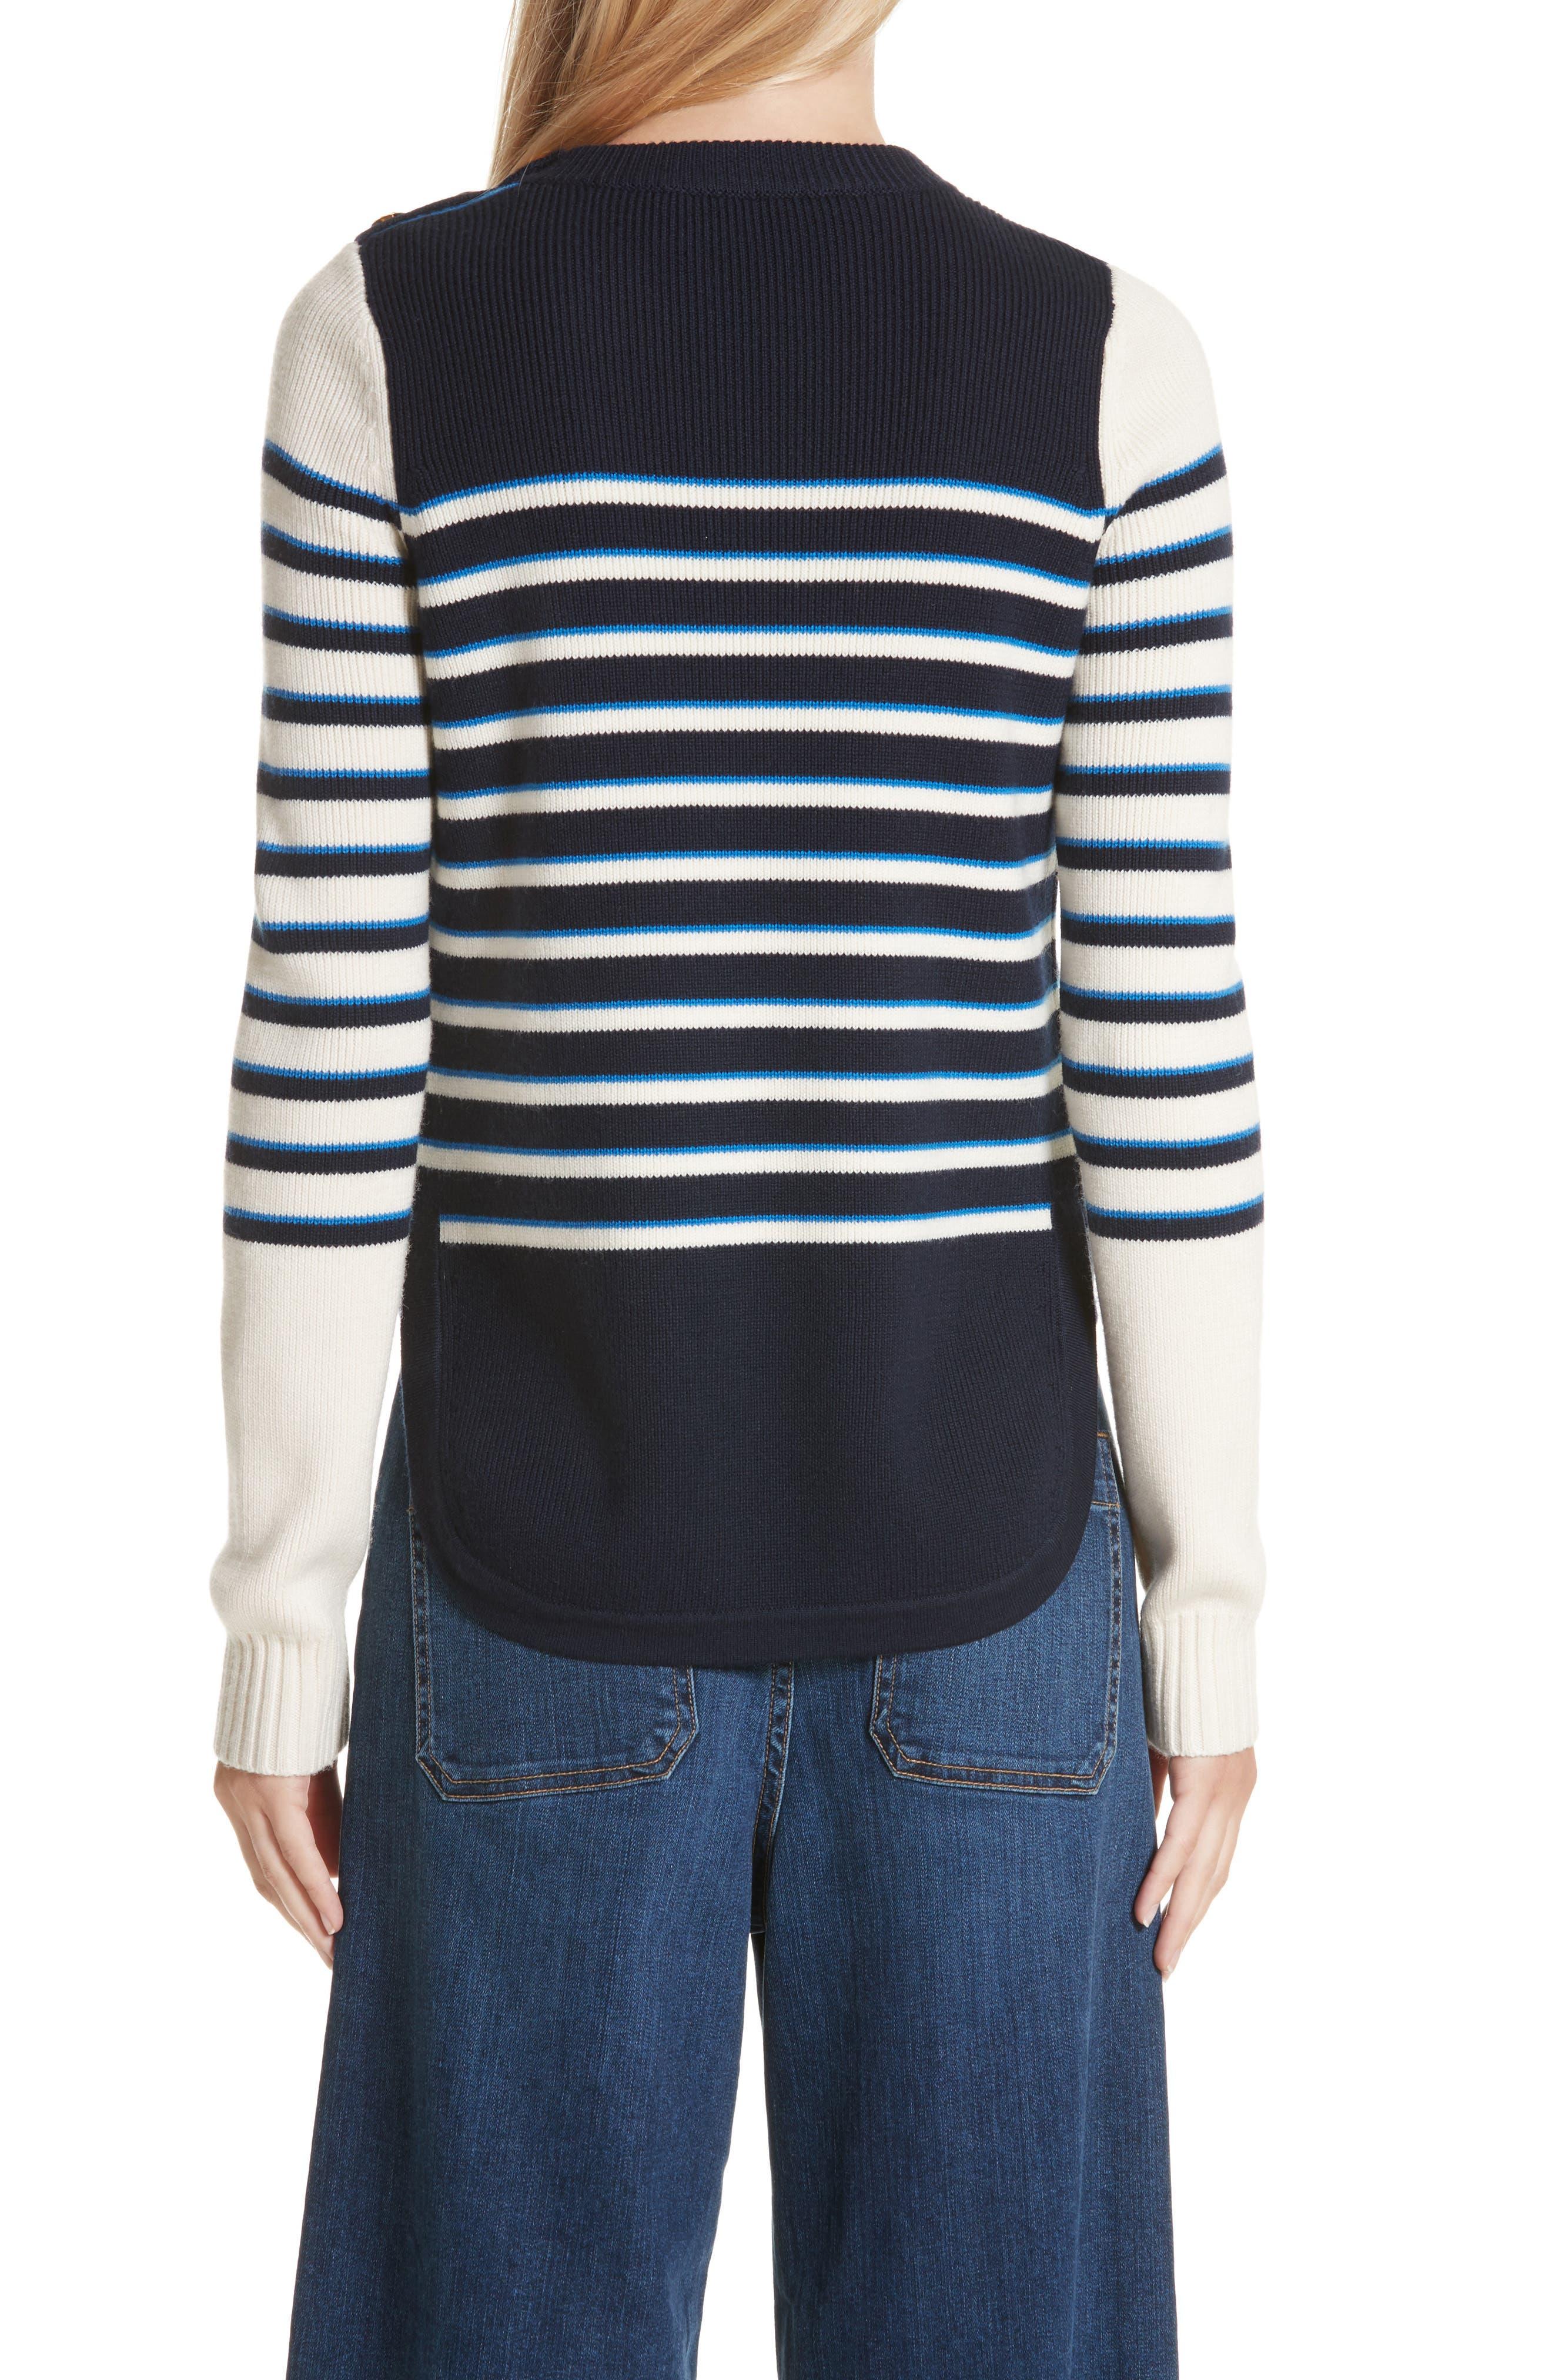 Amos Stripe Merino Wool Sweater,                             Alternate thumbnail 2, color,                             Navy/ Ivory/ Blue